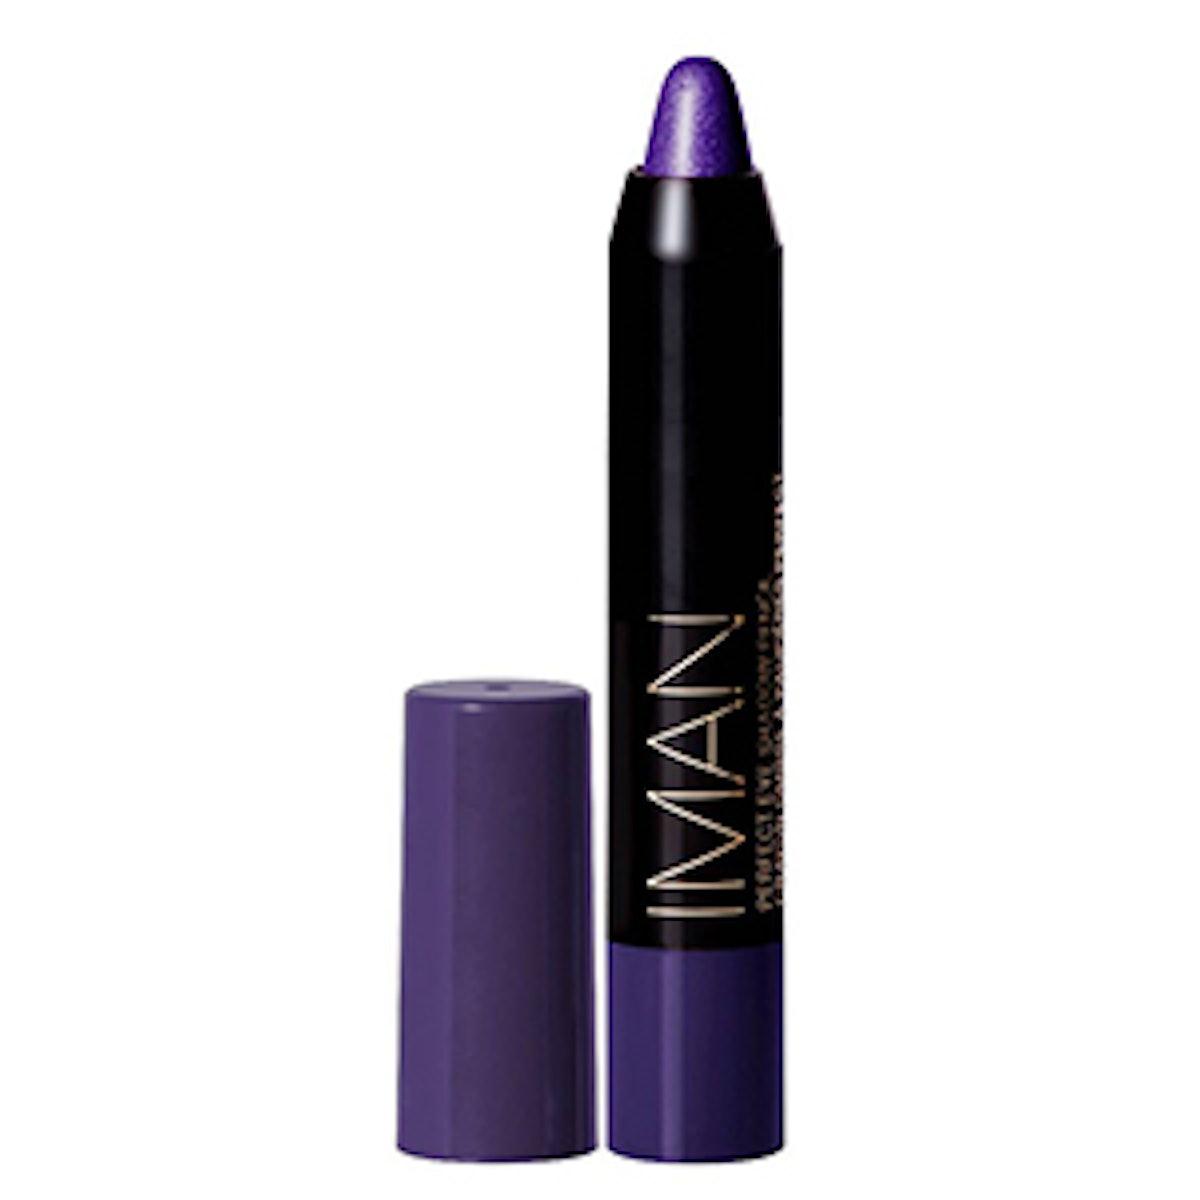 IMAN Perfect Eyeshadow Pencil in Seduction